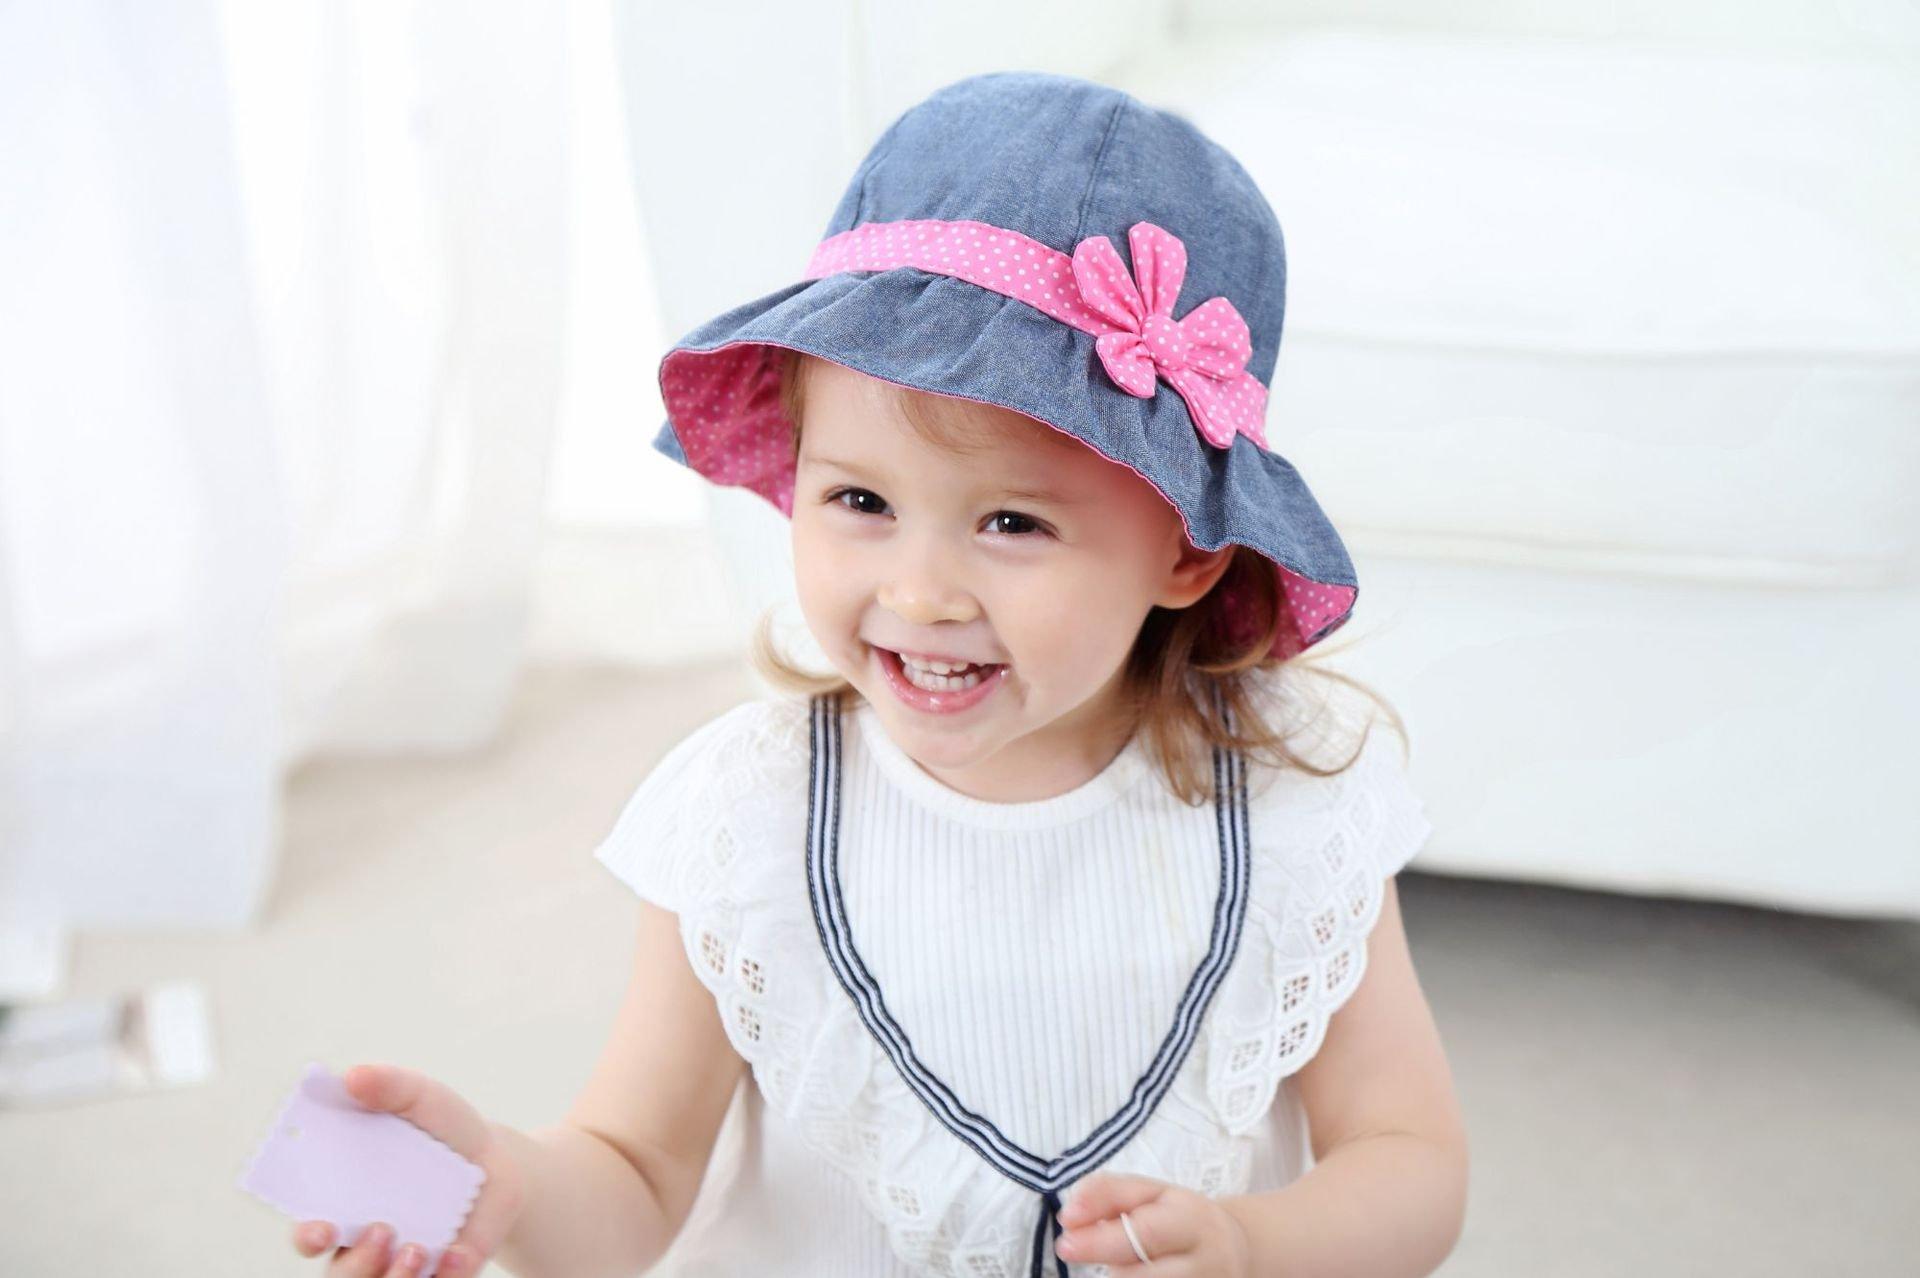 Toddler Baby Girls Denim Sun Hats with Chin Strap Kid Summer Cotton Sunhat Polka Dot Caps by HUIXIANG (Image #6)